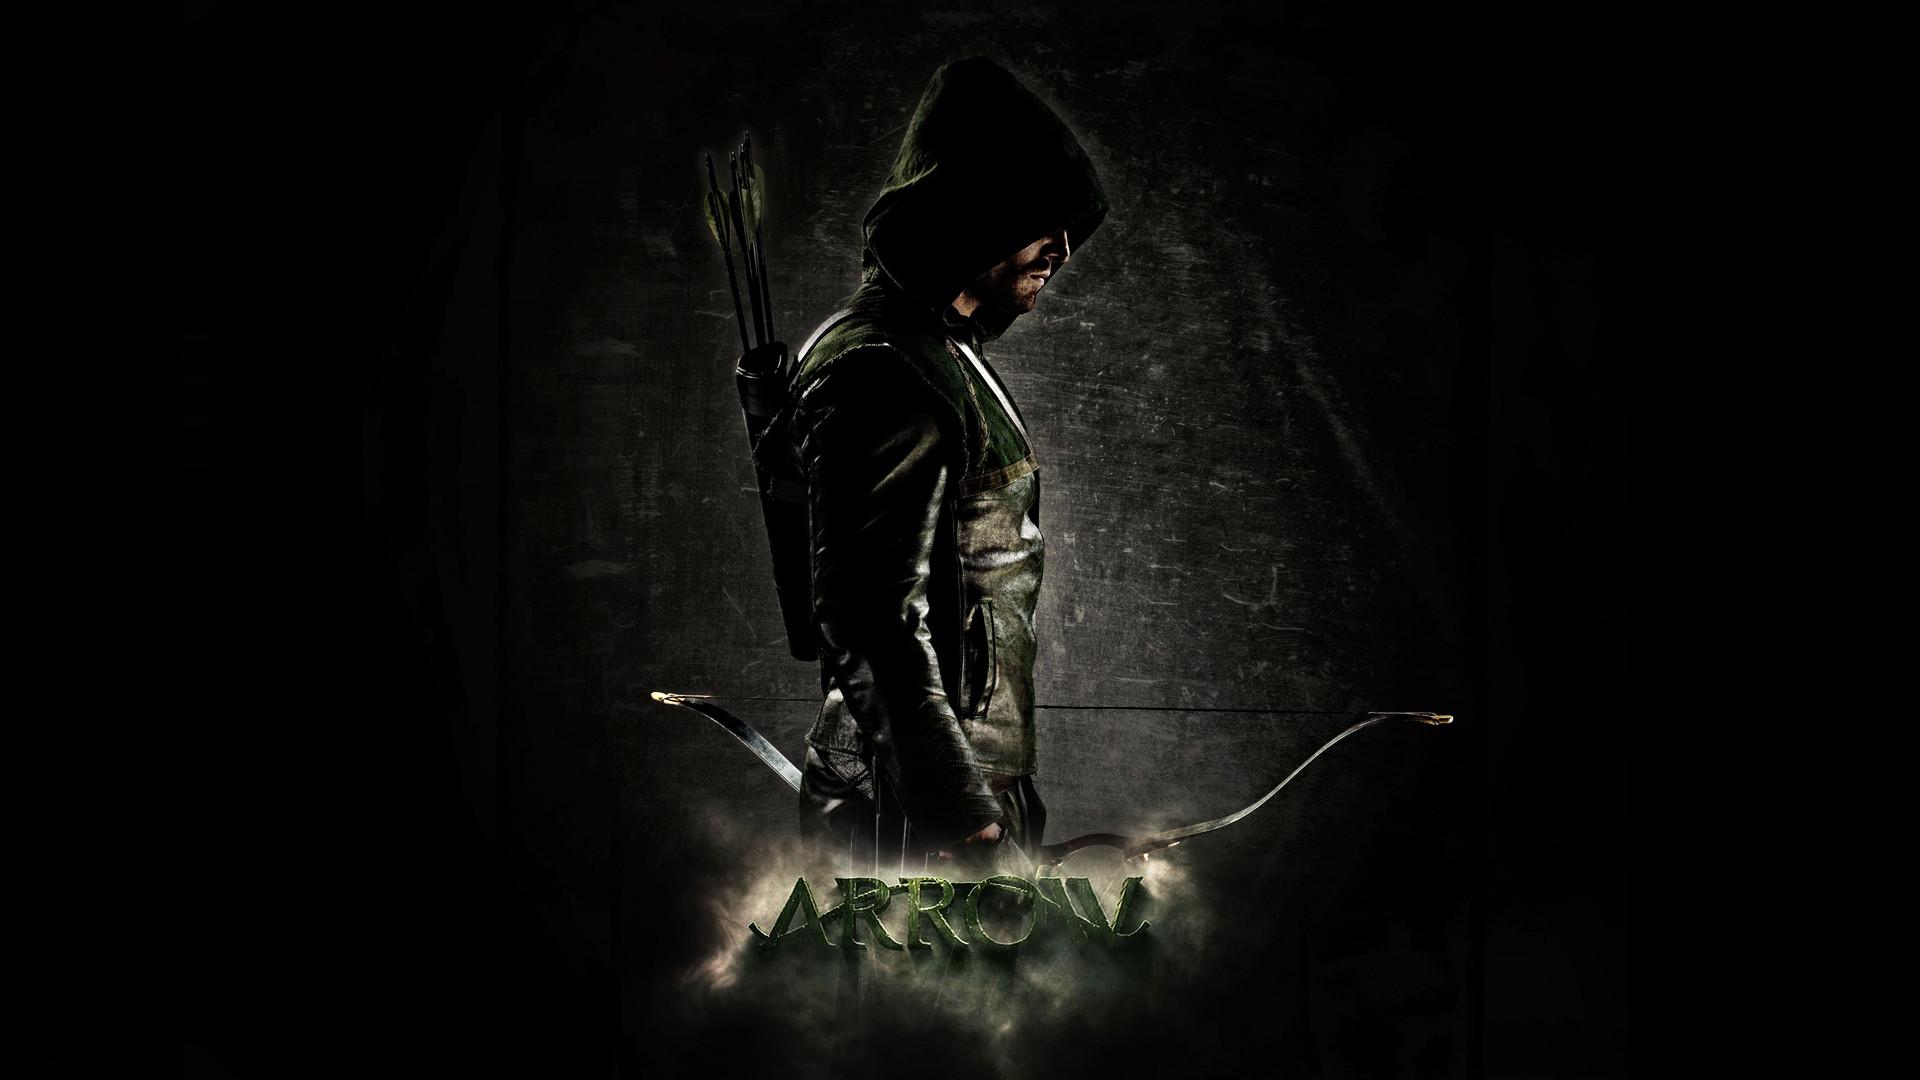 Green Arrow, the legend